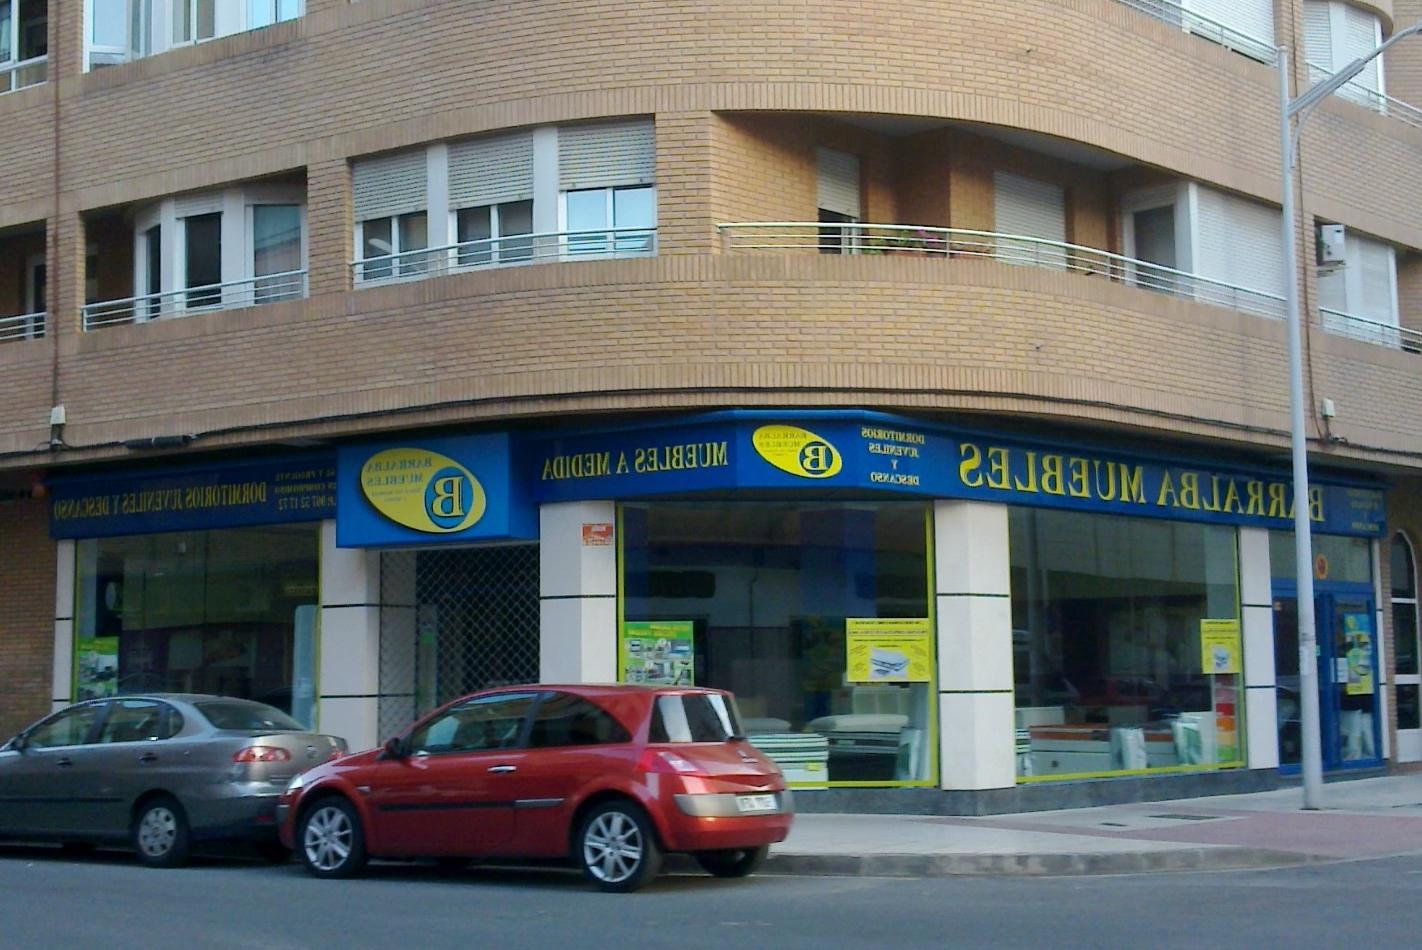 Tiendas Muebles Albacete J7do sofà S Y Sillones Delsofa En Albacete En Barralba Muebles